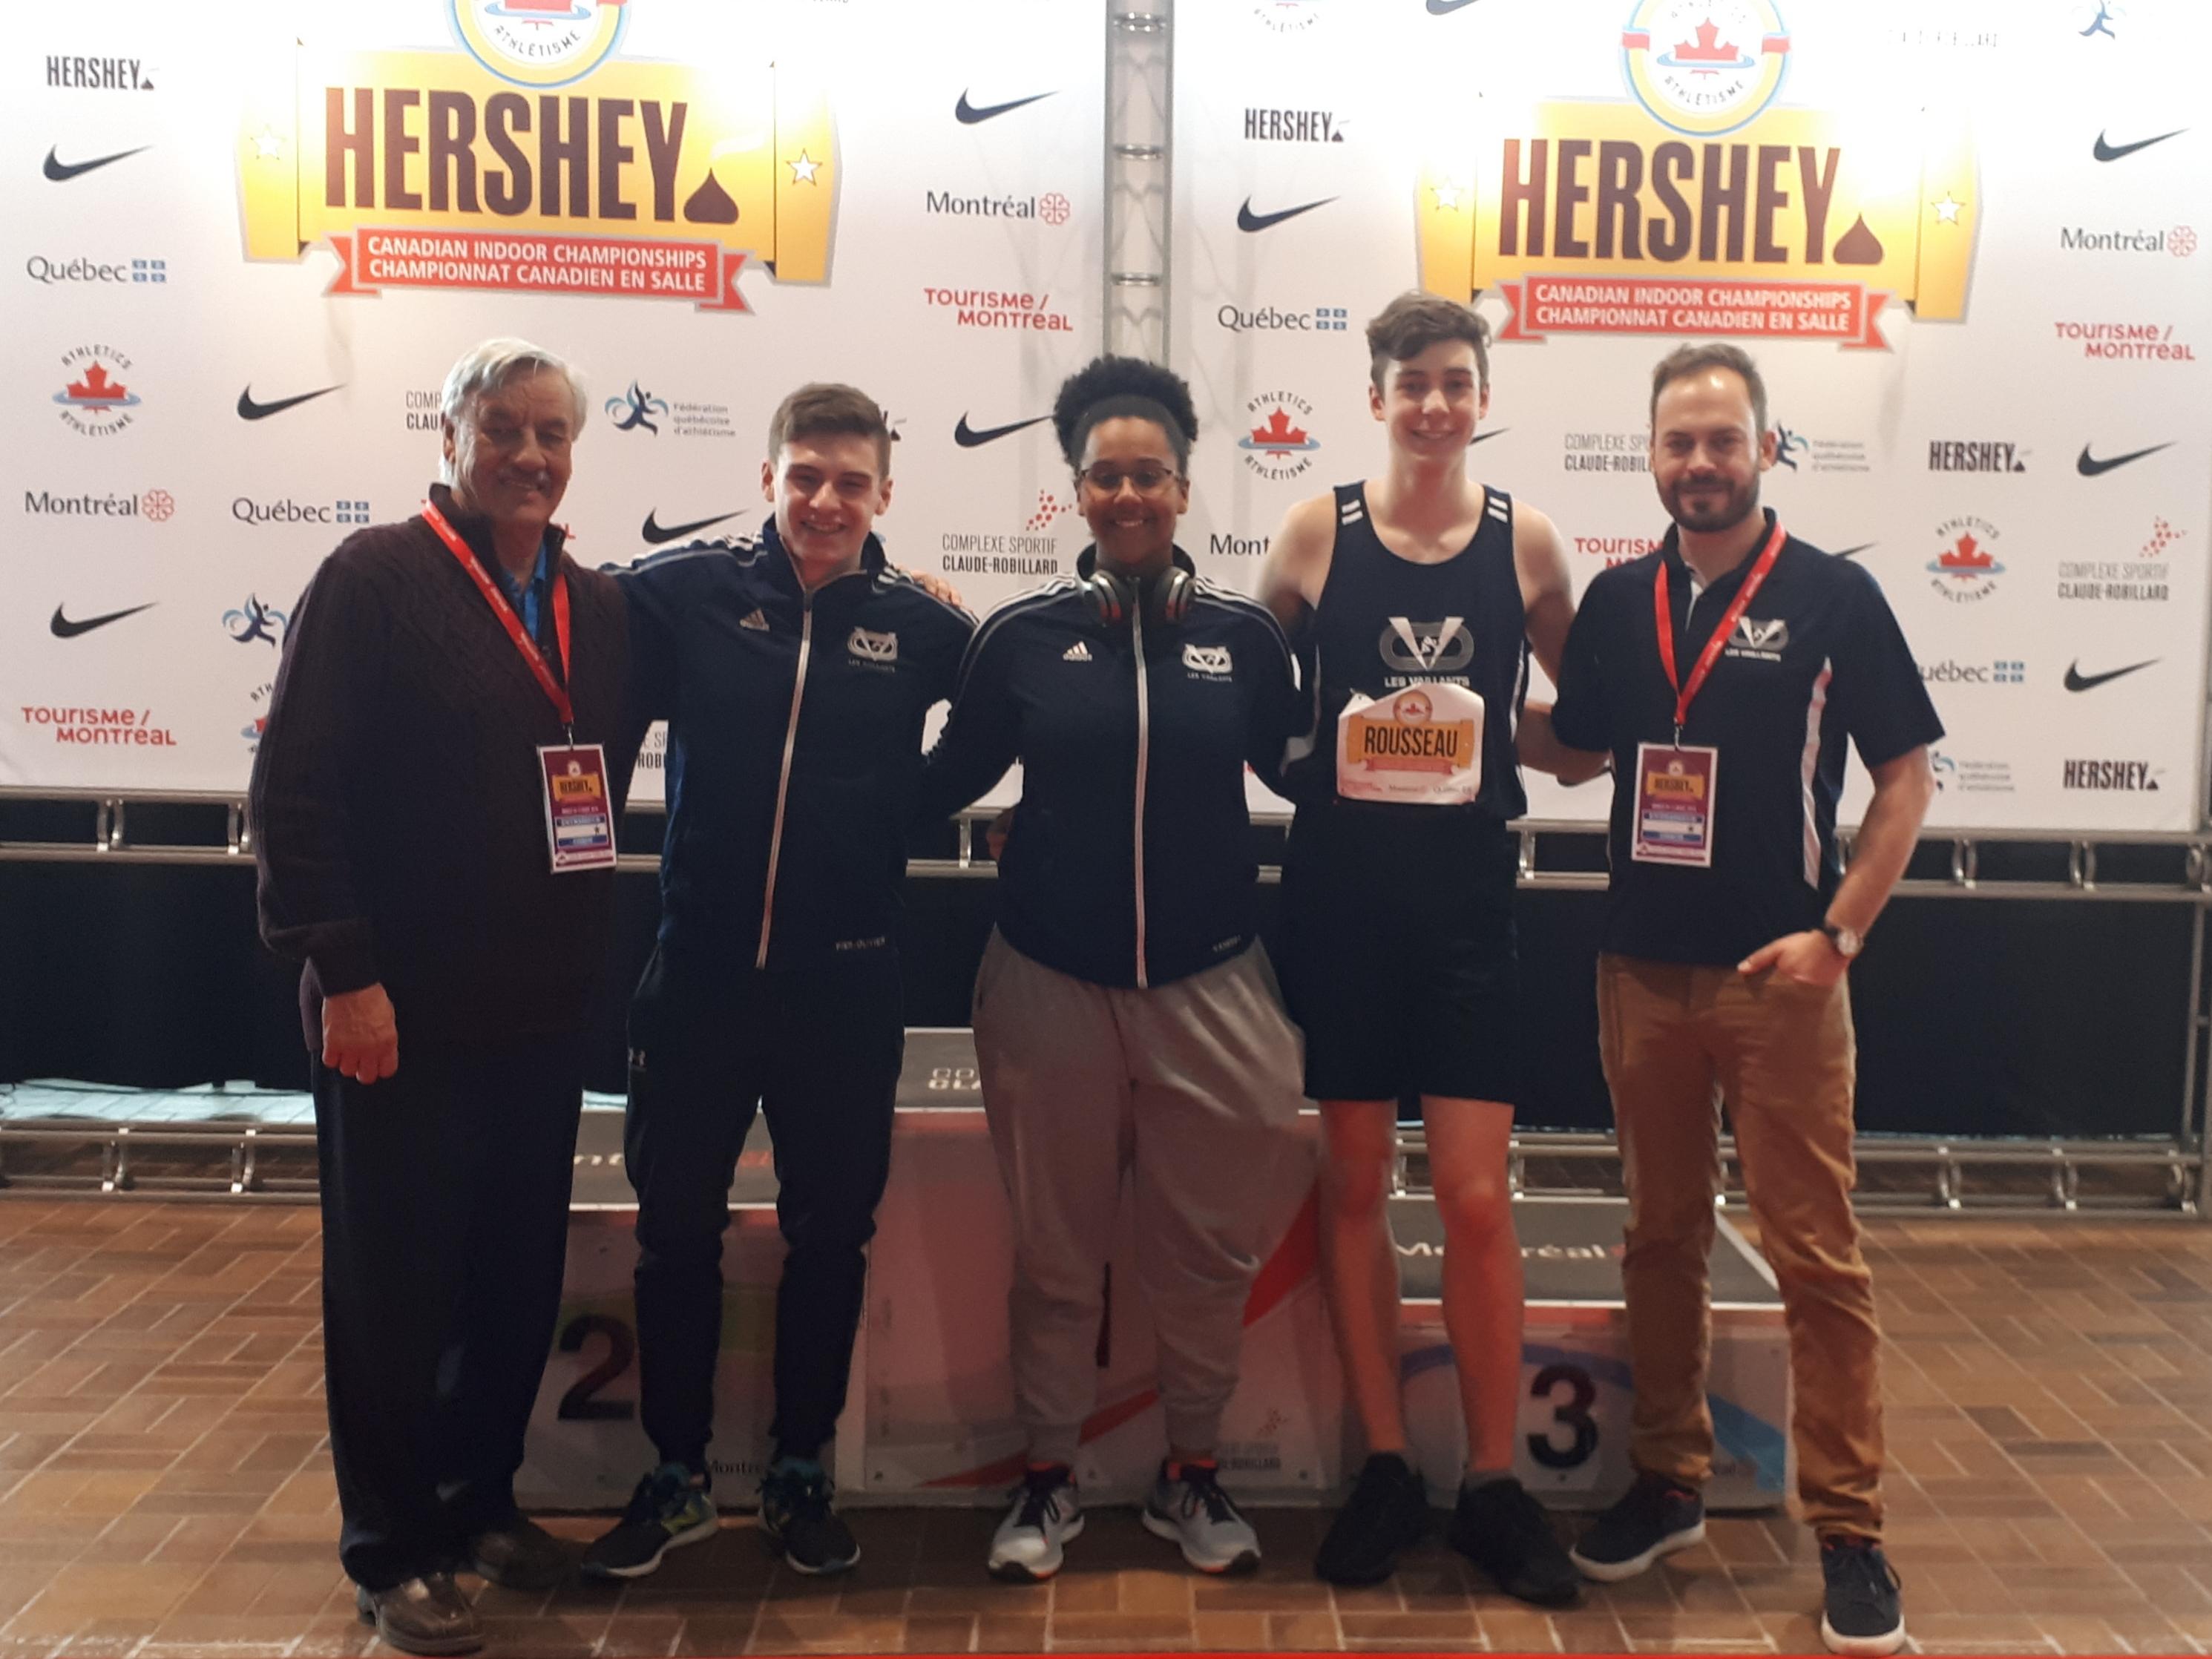 Championnat canadien Hershey